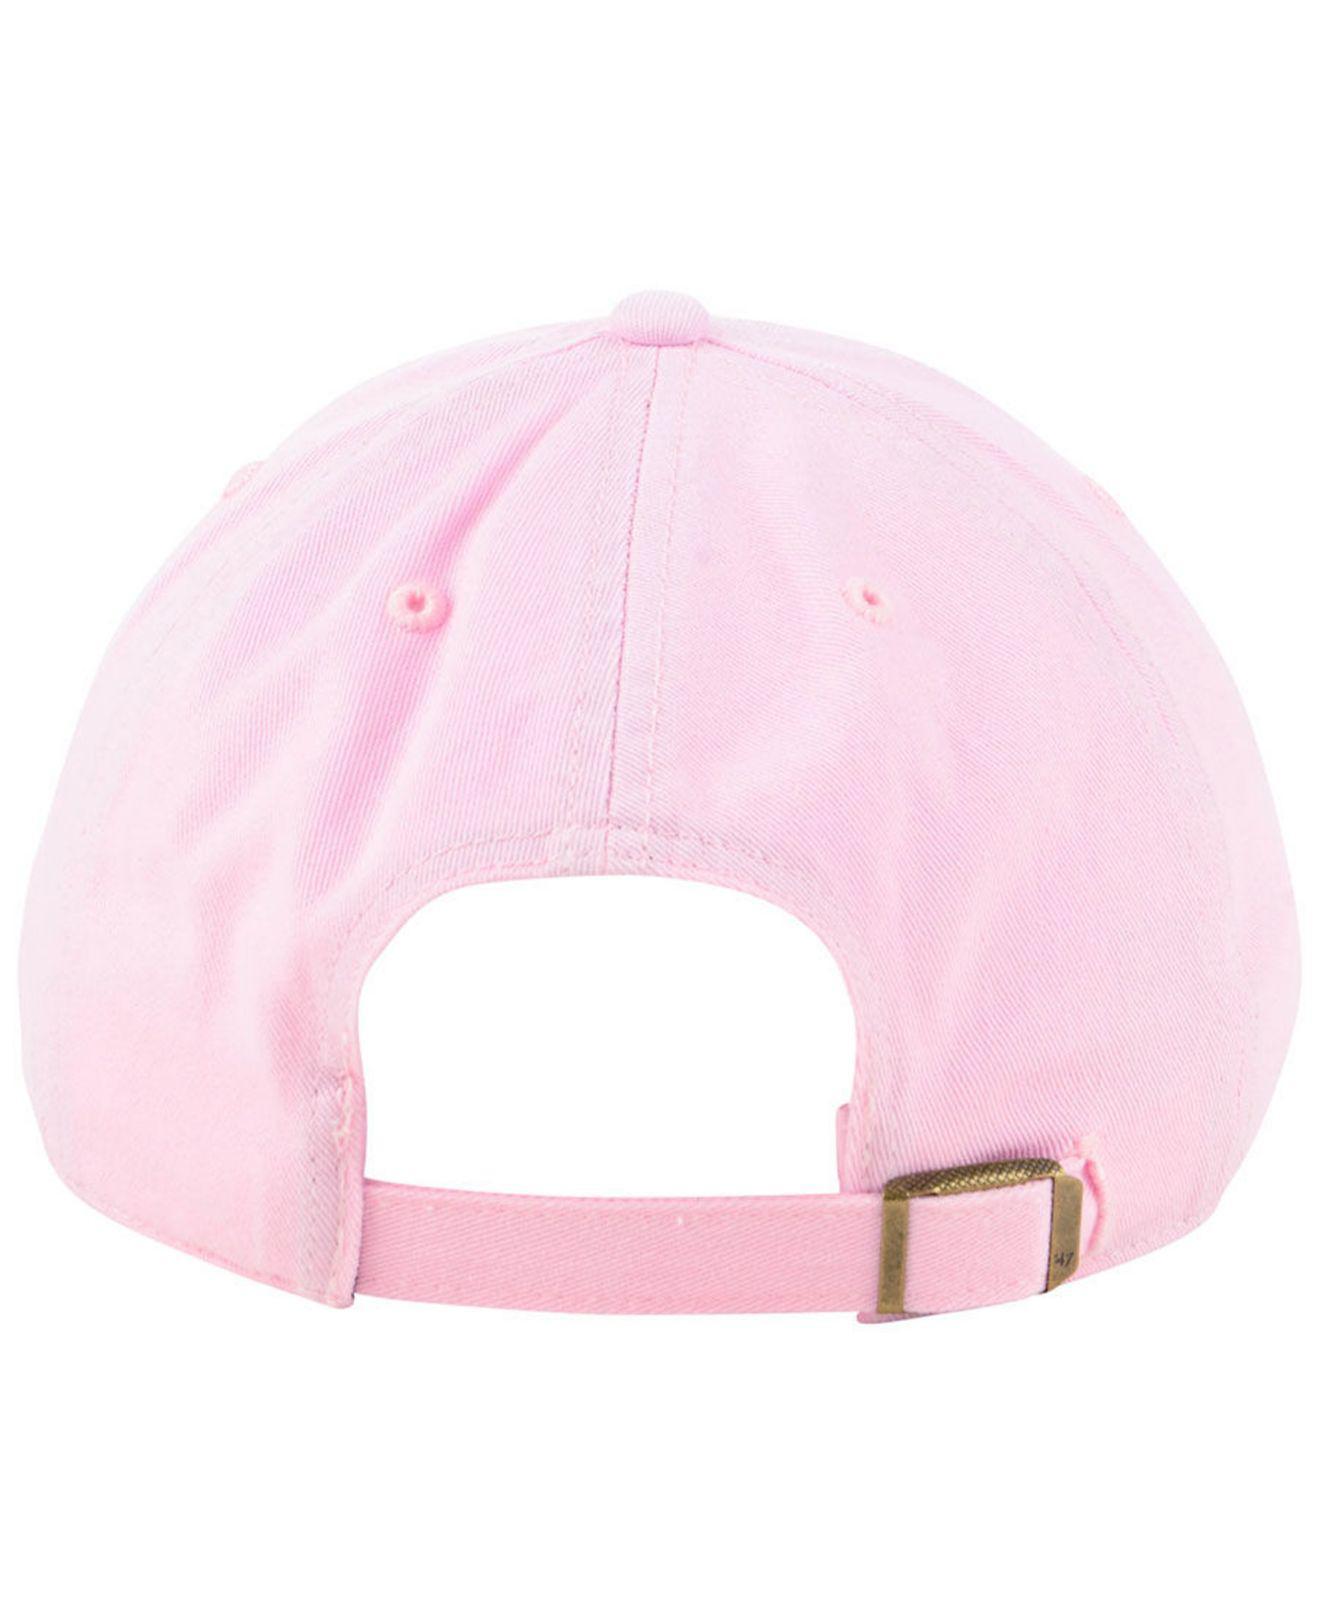 fa9f25a12d3 ... australia lyst 47 brand miami marlins pink clean up cap in pink 9c034  4c457